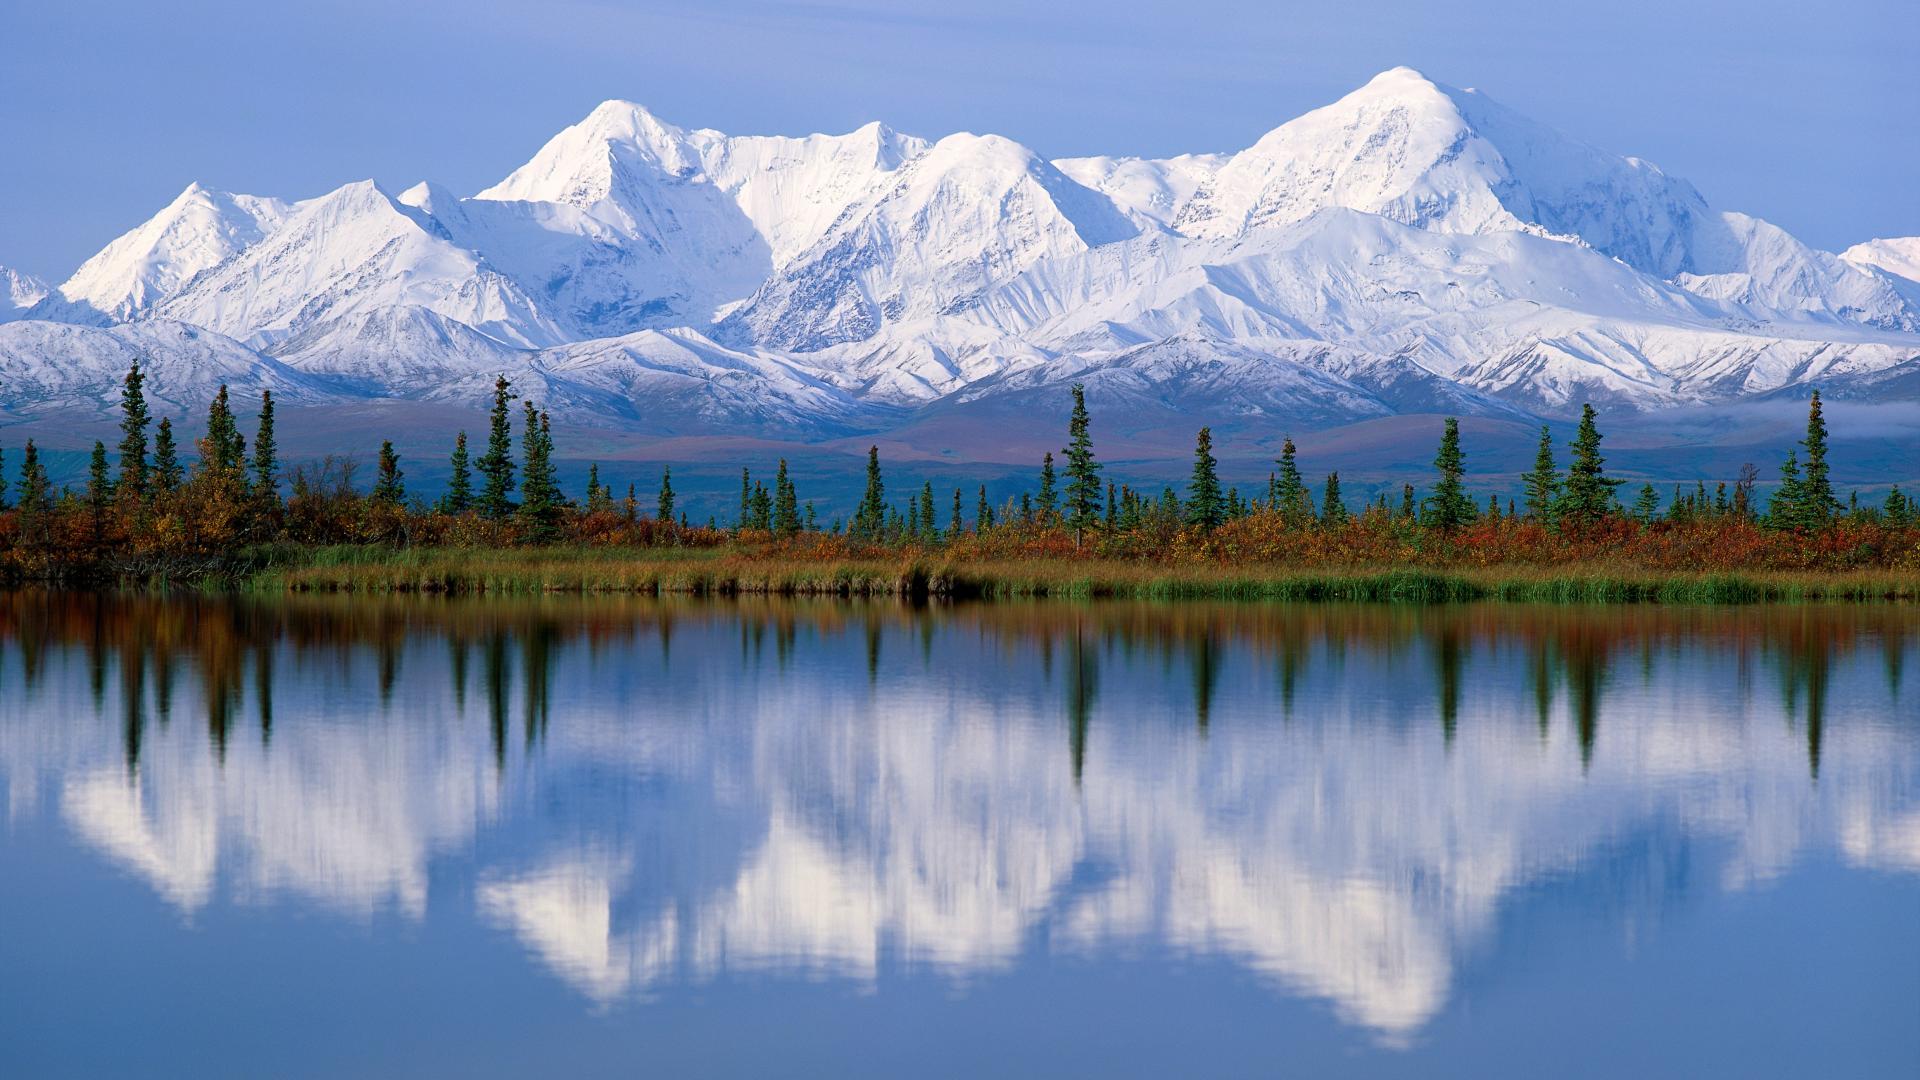 Amazing Beautiful Nature Wallpapers HD HD Nature Desktop 1920x1080